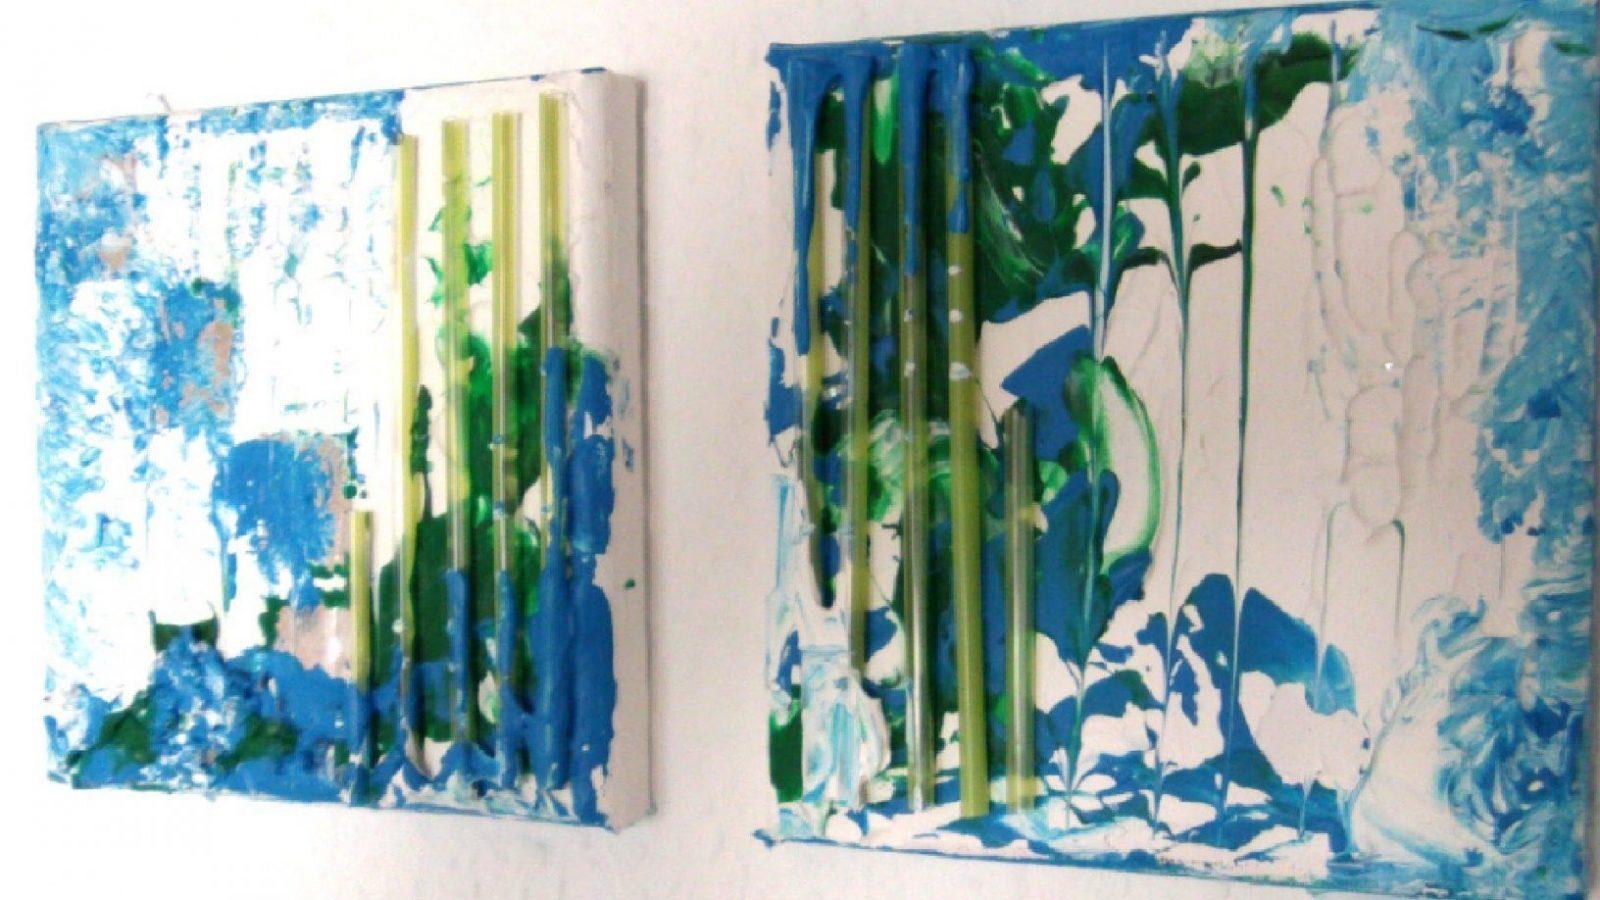 Abstrakt Malen Mit Acryl (Abstract Painting With Acrylic)[Hd]  Youtube von Abstrakte Acrylbilder Selber Malen Bild